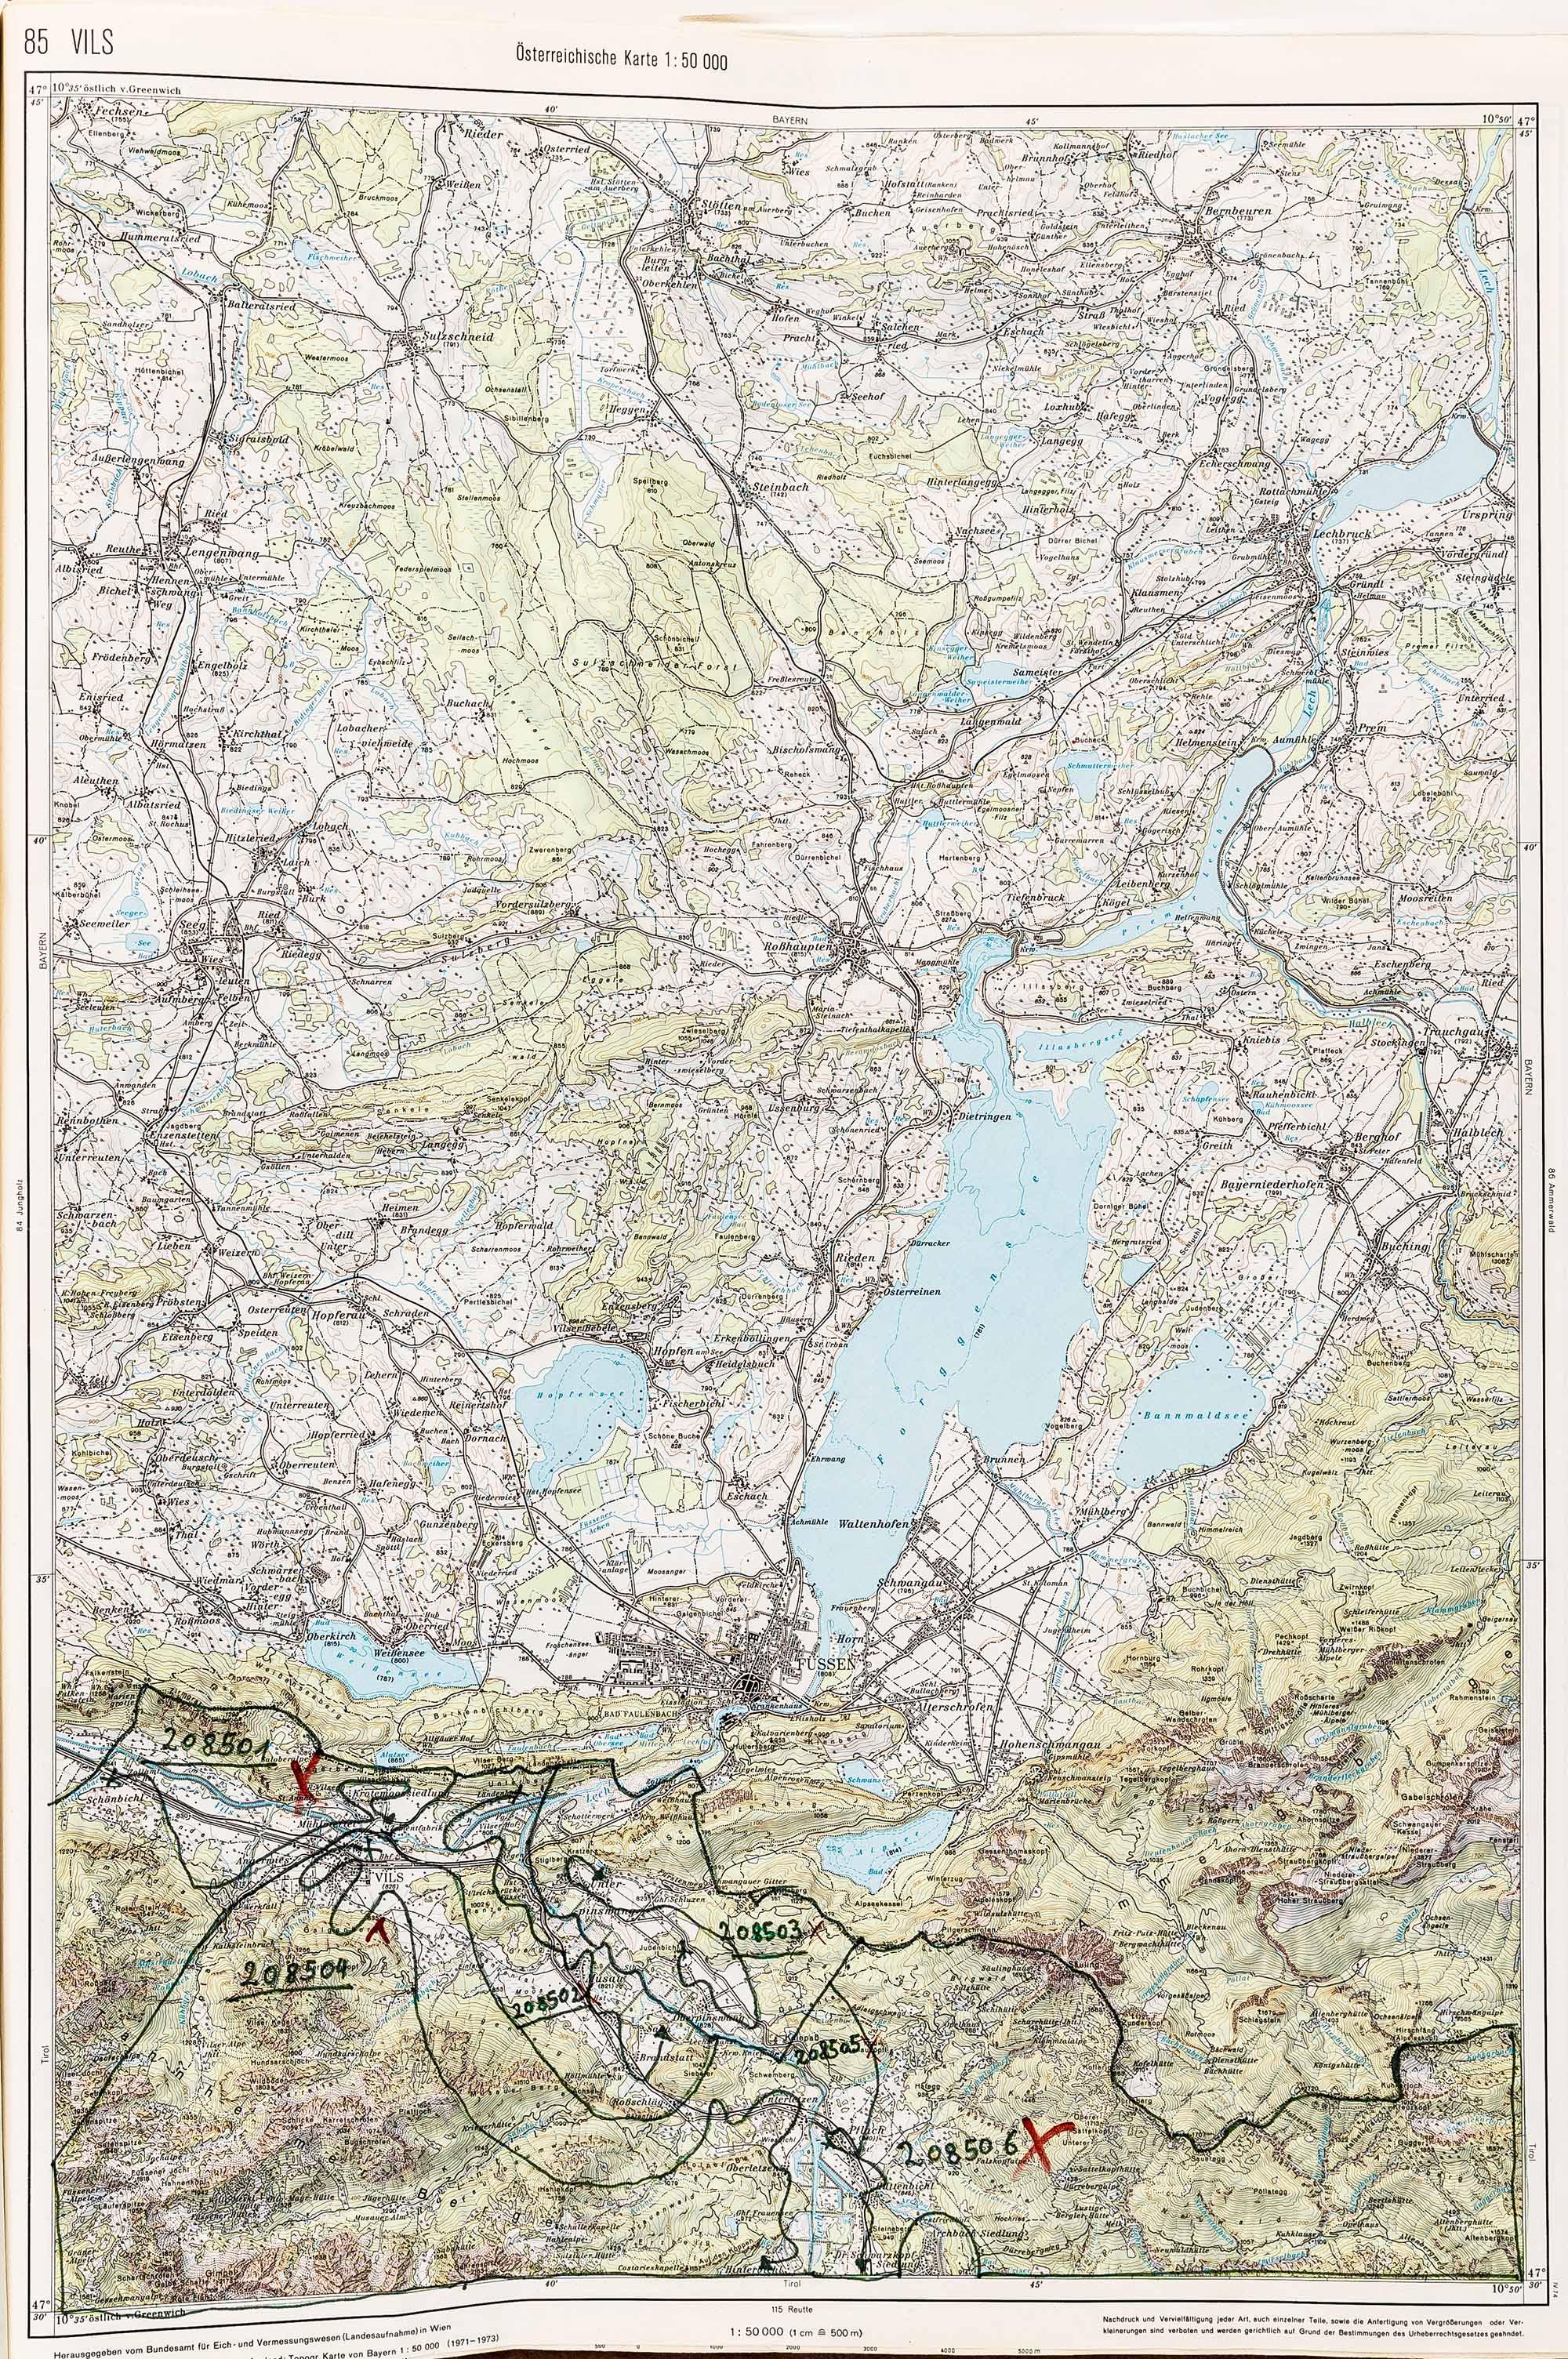 1979-1982 Karte 085